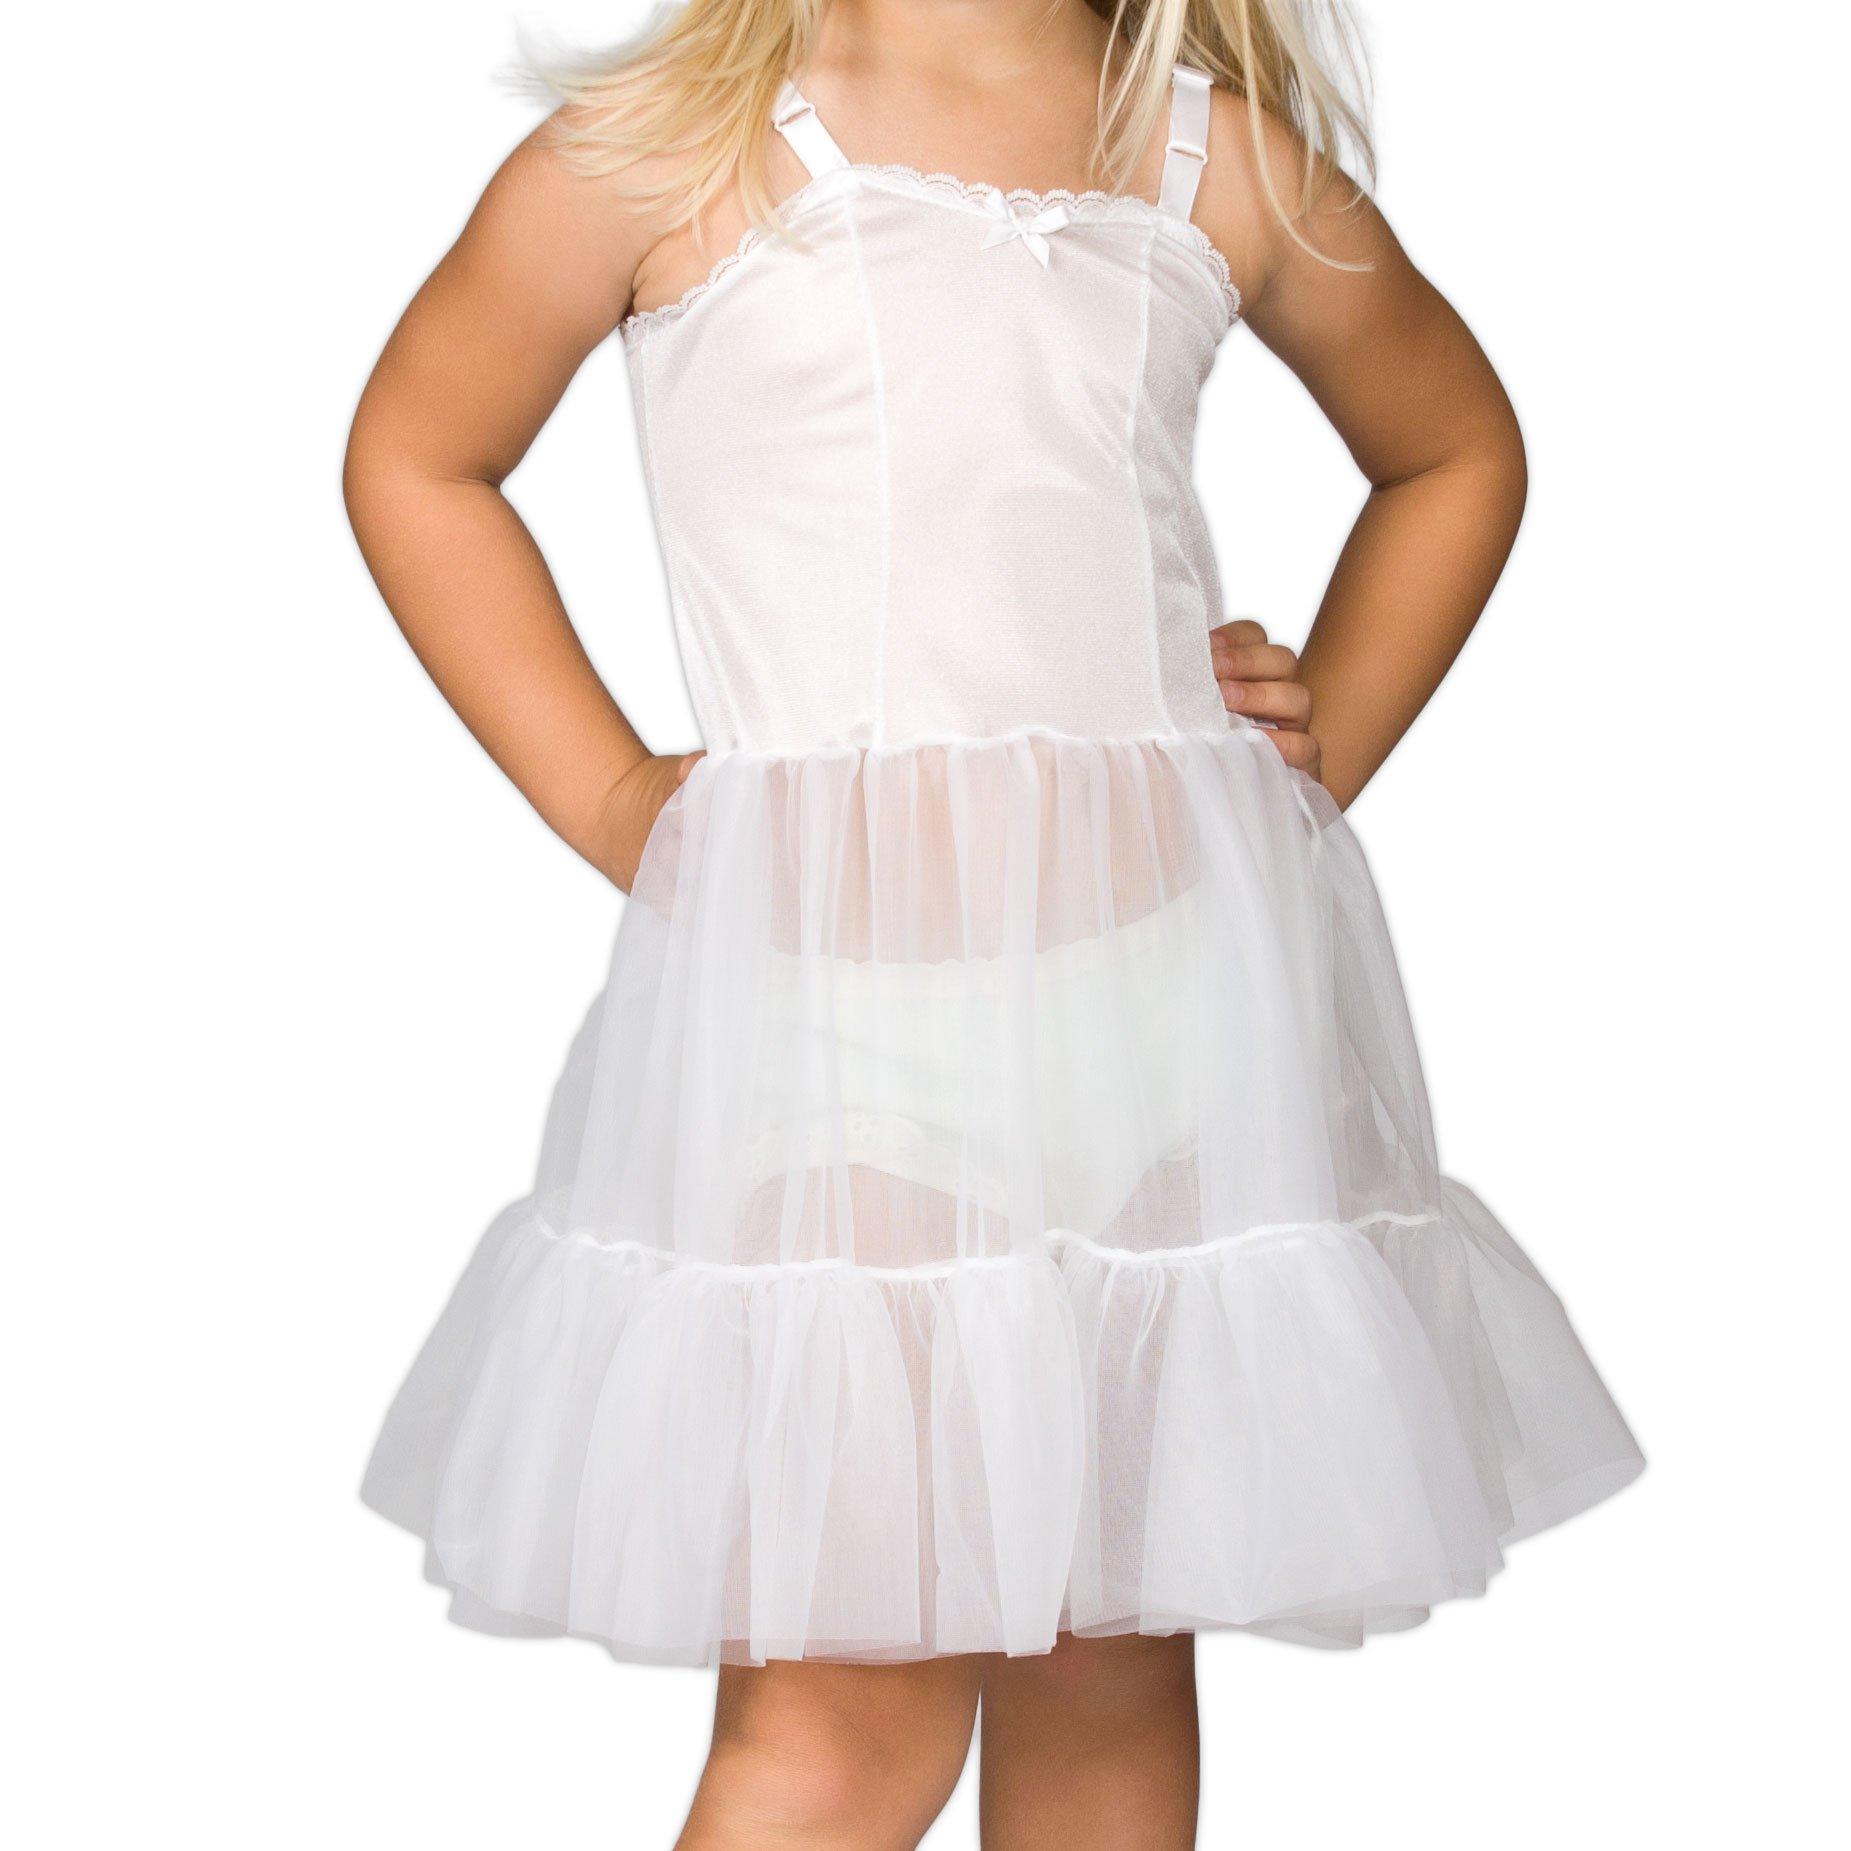 I.C. Collections Little Girls White Bouffant Sweetheart Slip, 5